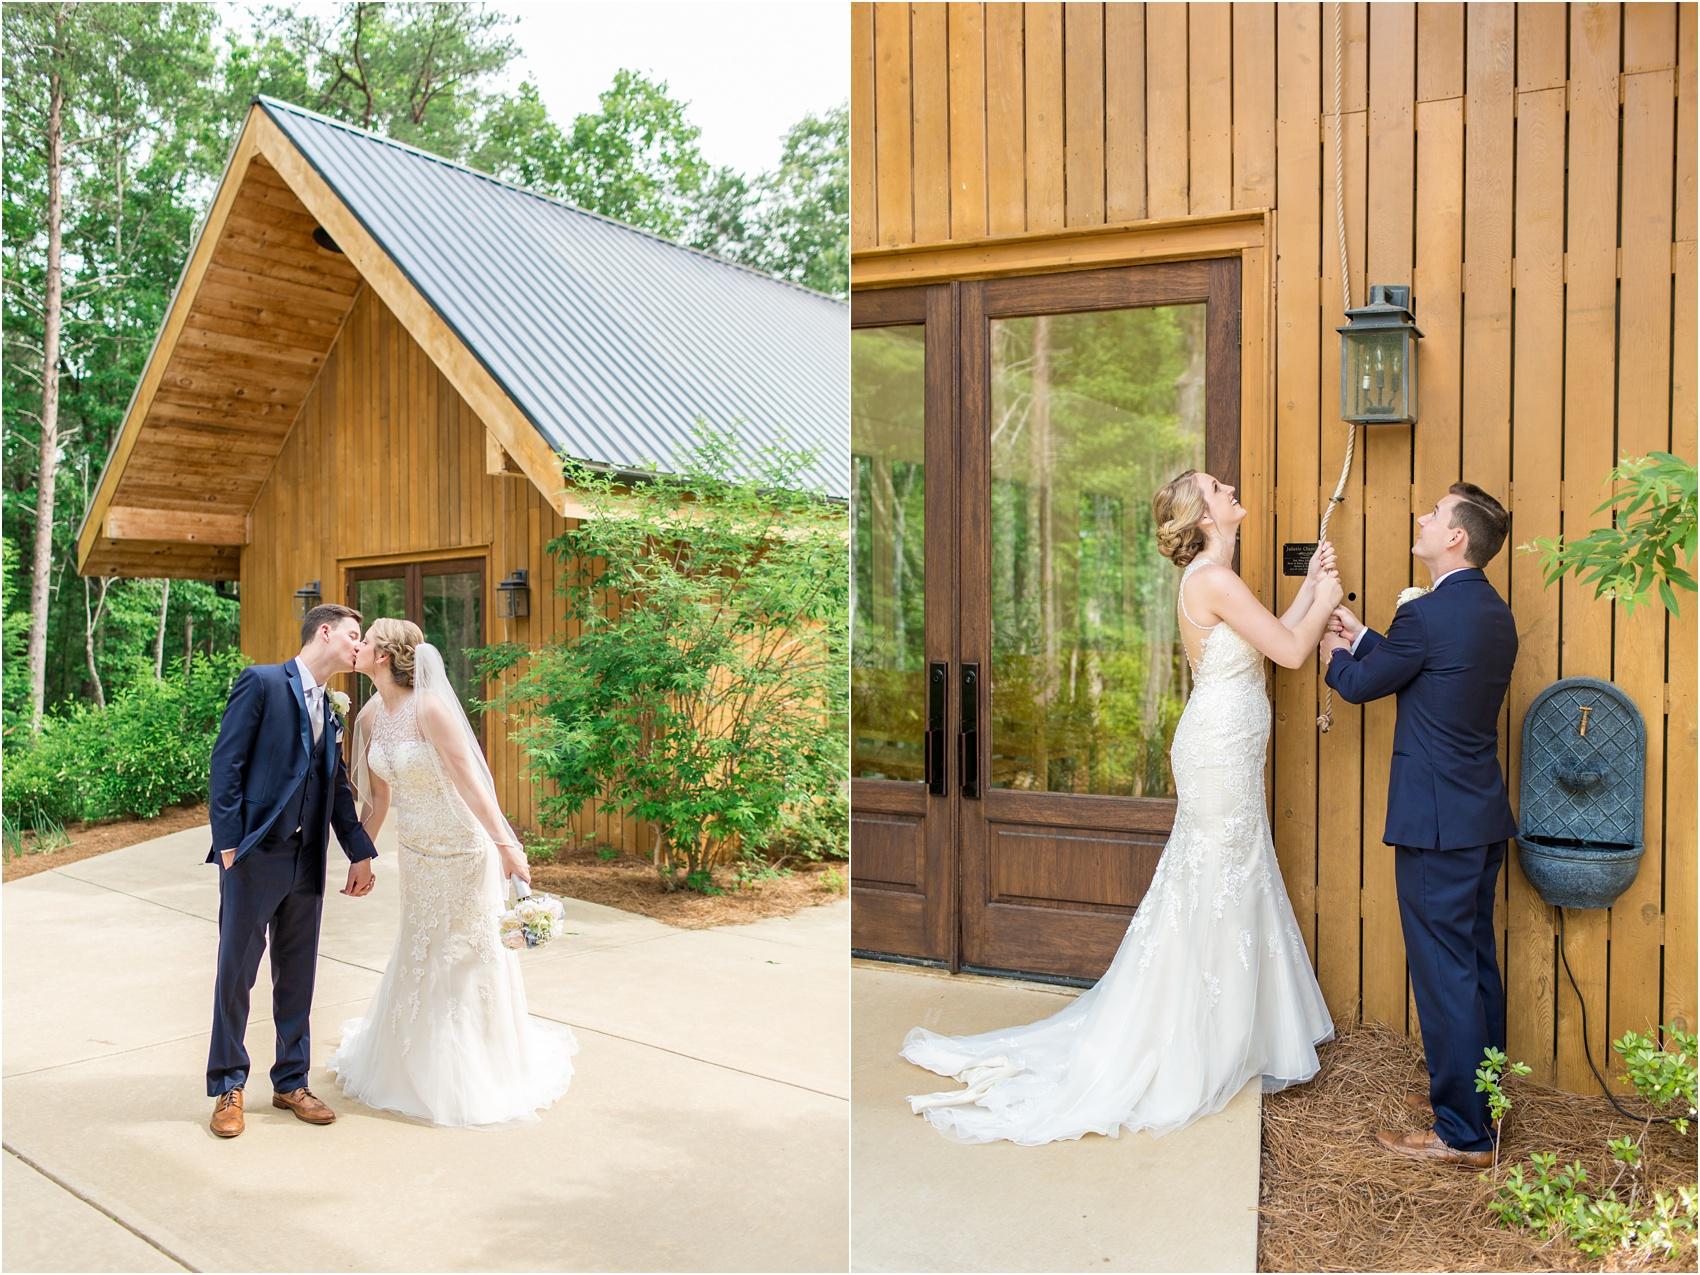 Savannah Eve Photography- Roper-Powell Wedding- Blog-47.jpg